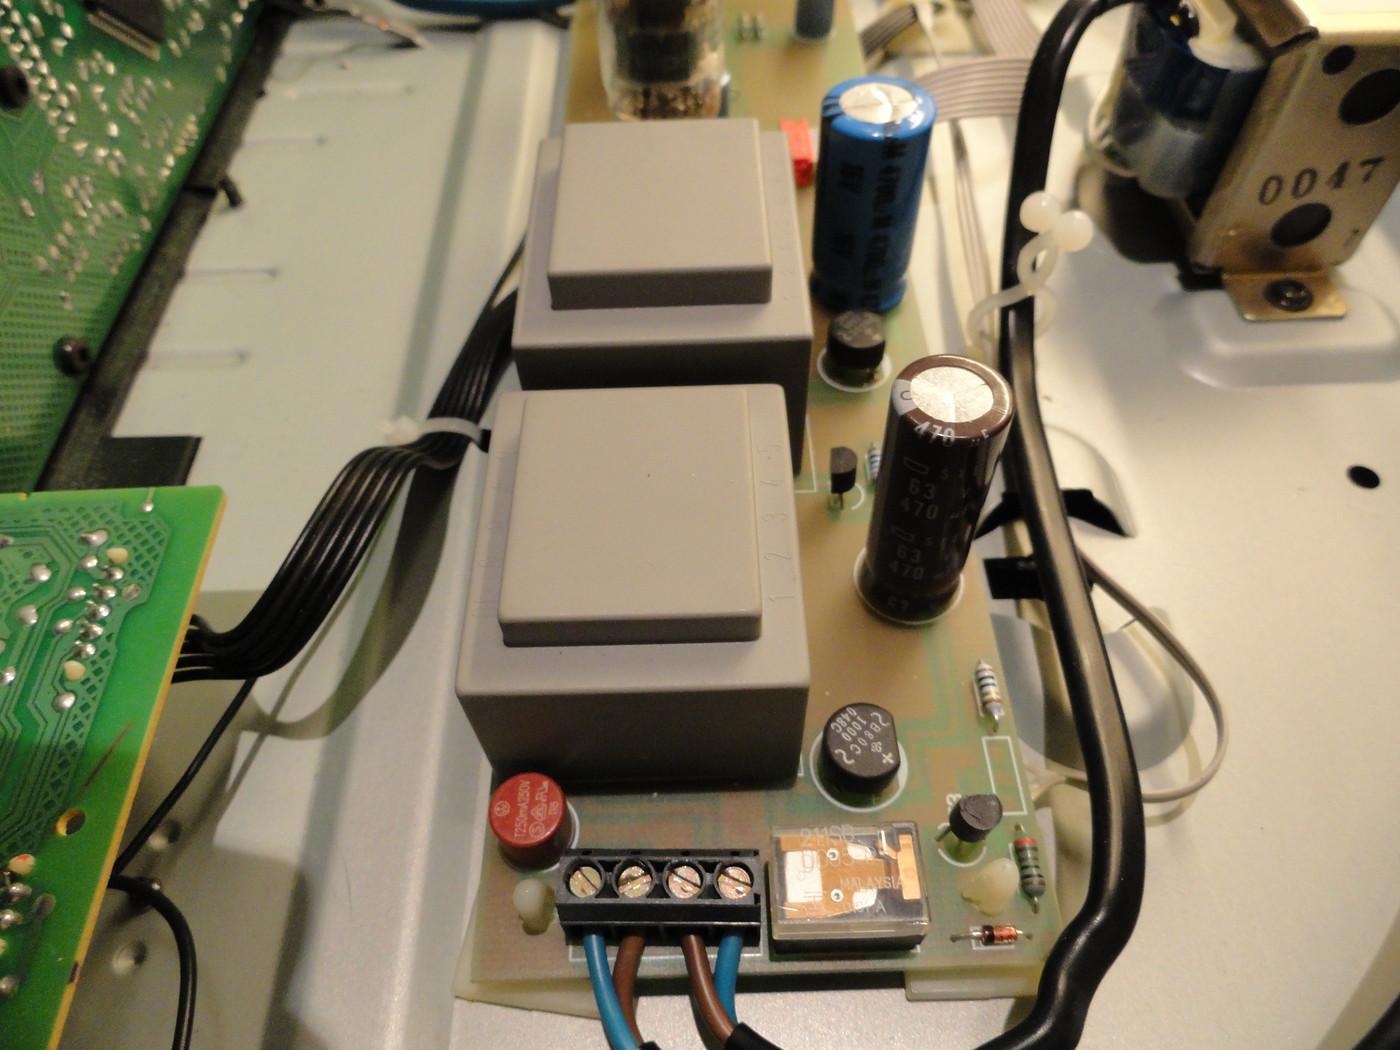 Photo Dsc01256 Marantz Cd5000 Mod Album Marcymarc Fotkicom Electrical Wiring Made Easy